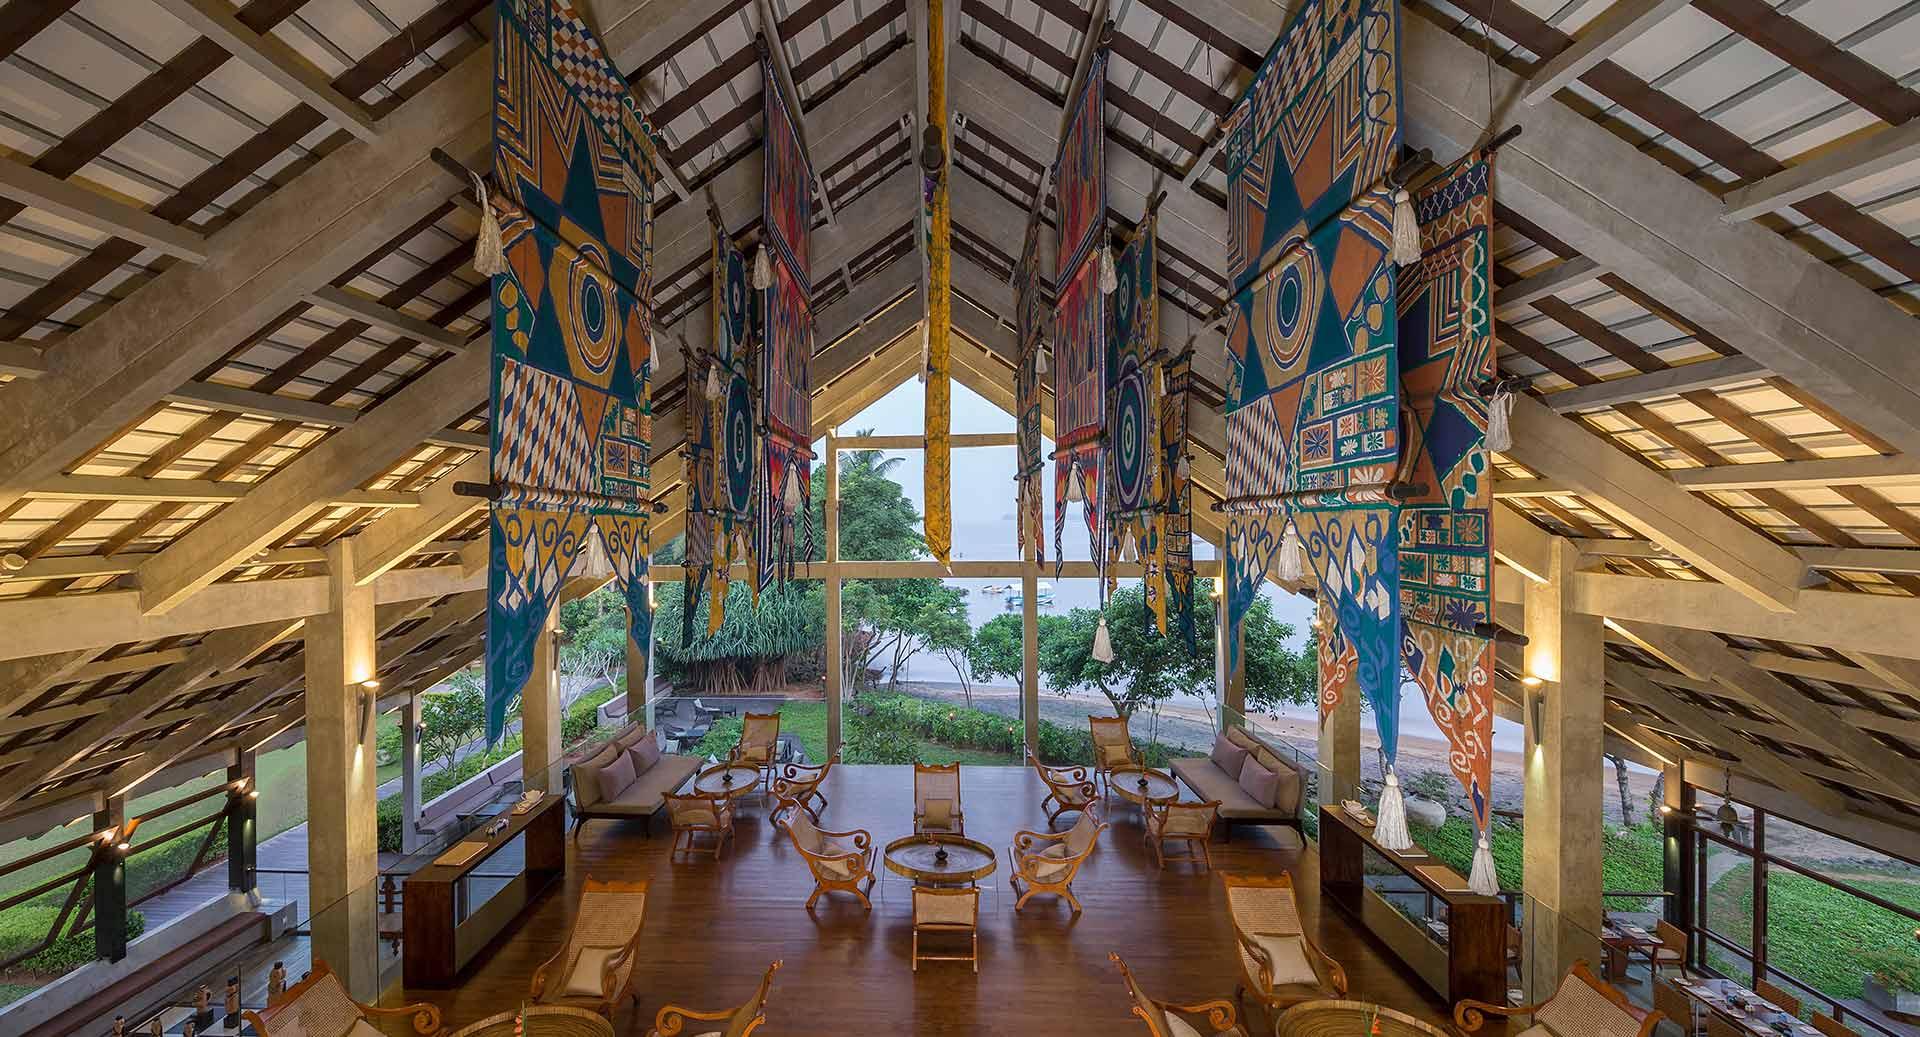 Photo Gallery | Images of Anantara Kalutara Sri Lanka